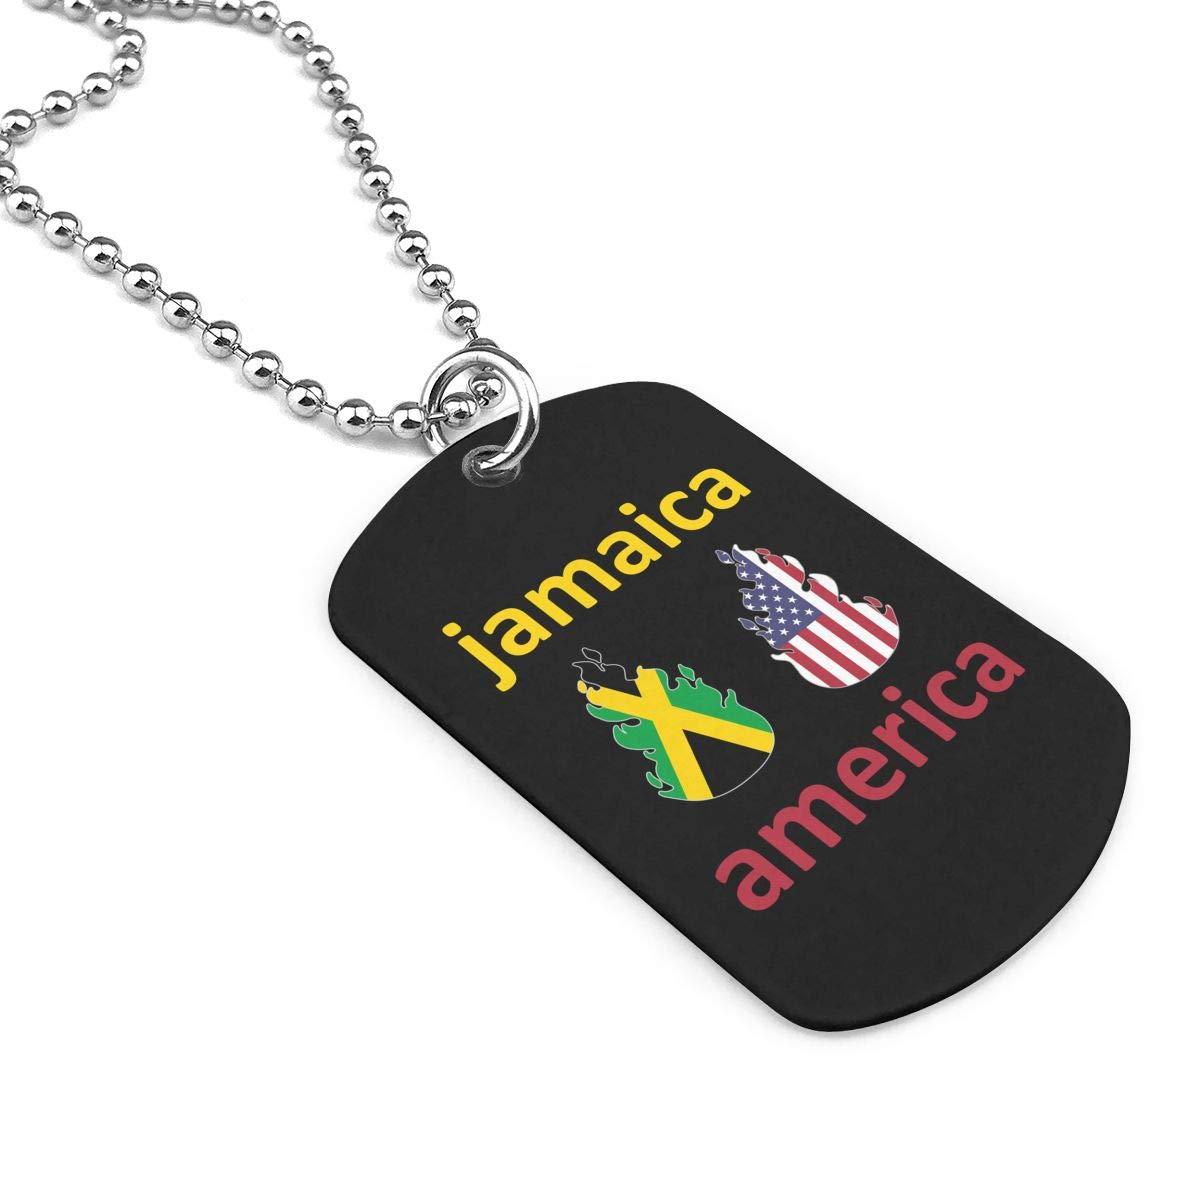 Military Necklace American Jamaica Fire Custom Zinc Alloy Pendant Necklace Dog Tags